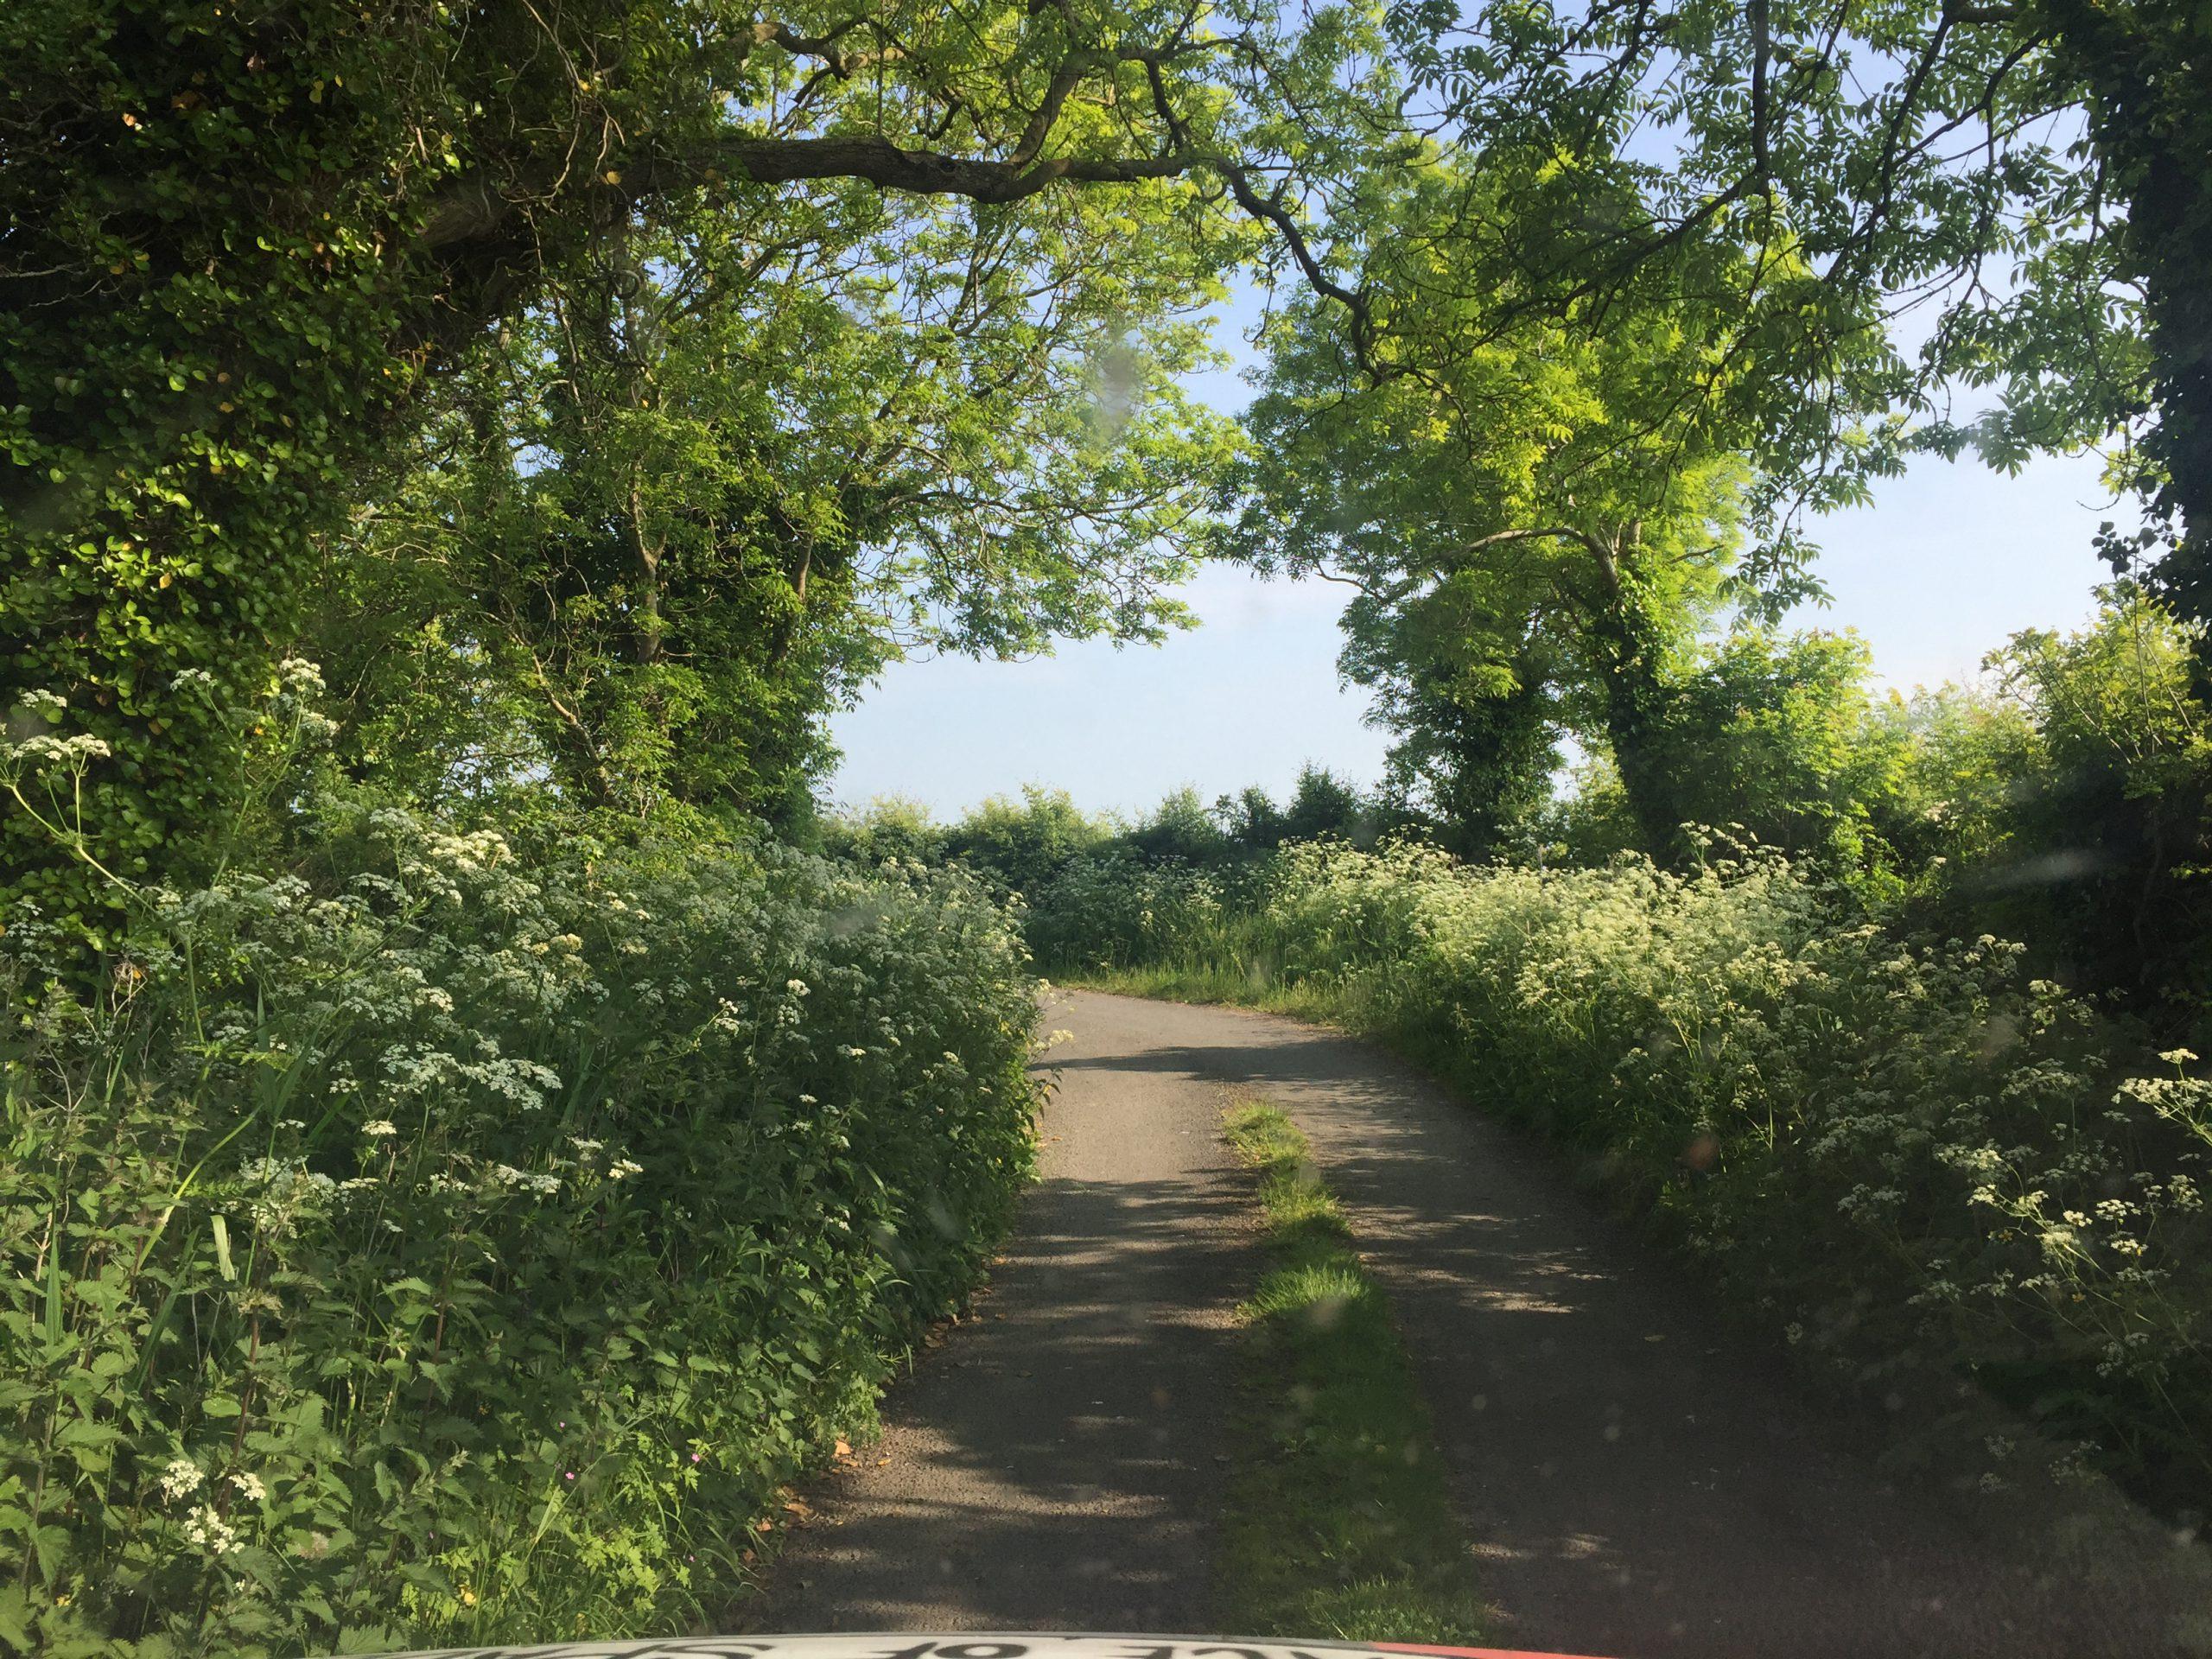 Day 7: The Scenic Irish Backroads Tourists Never See #HIUK16